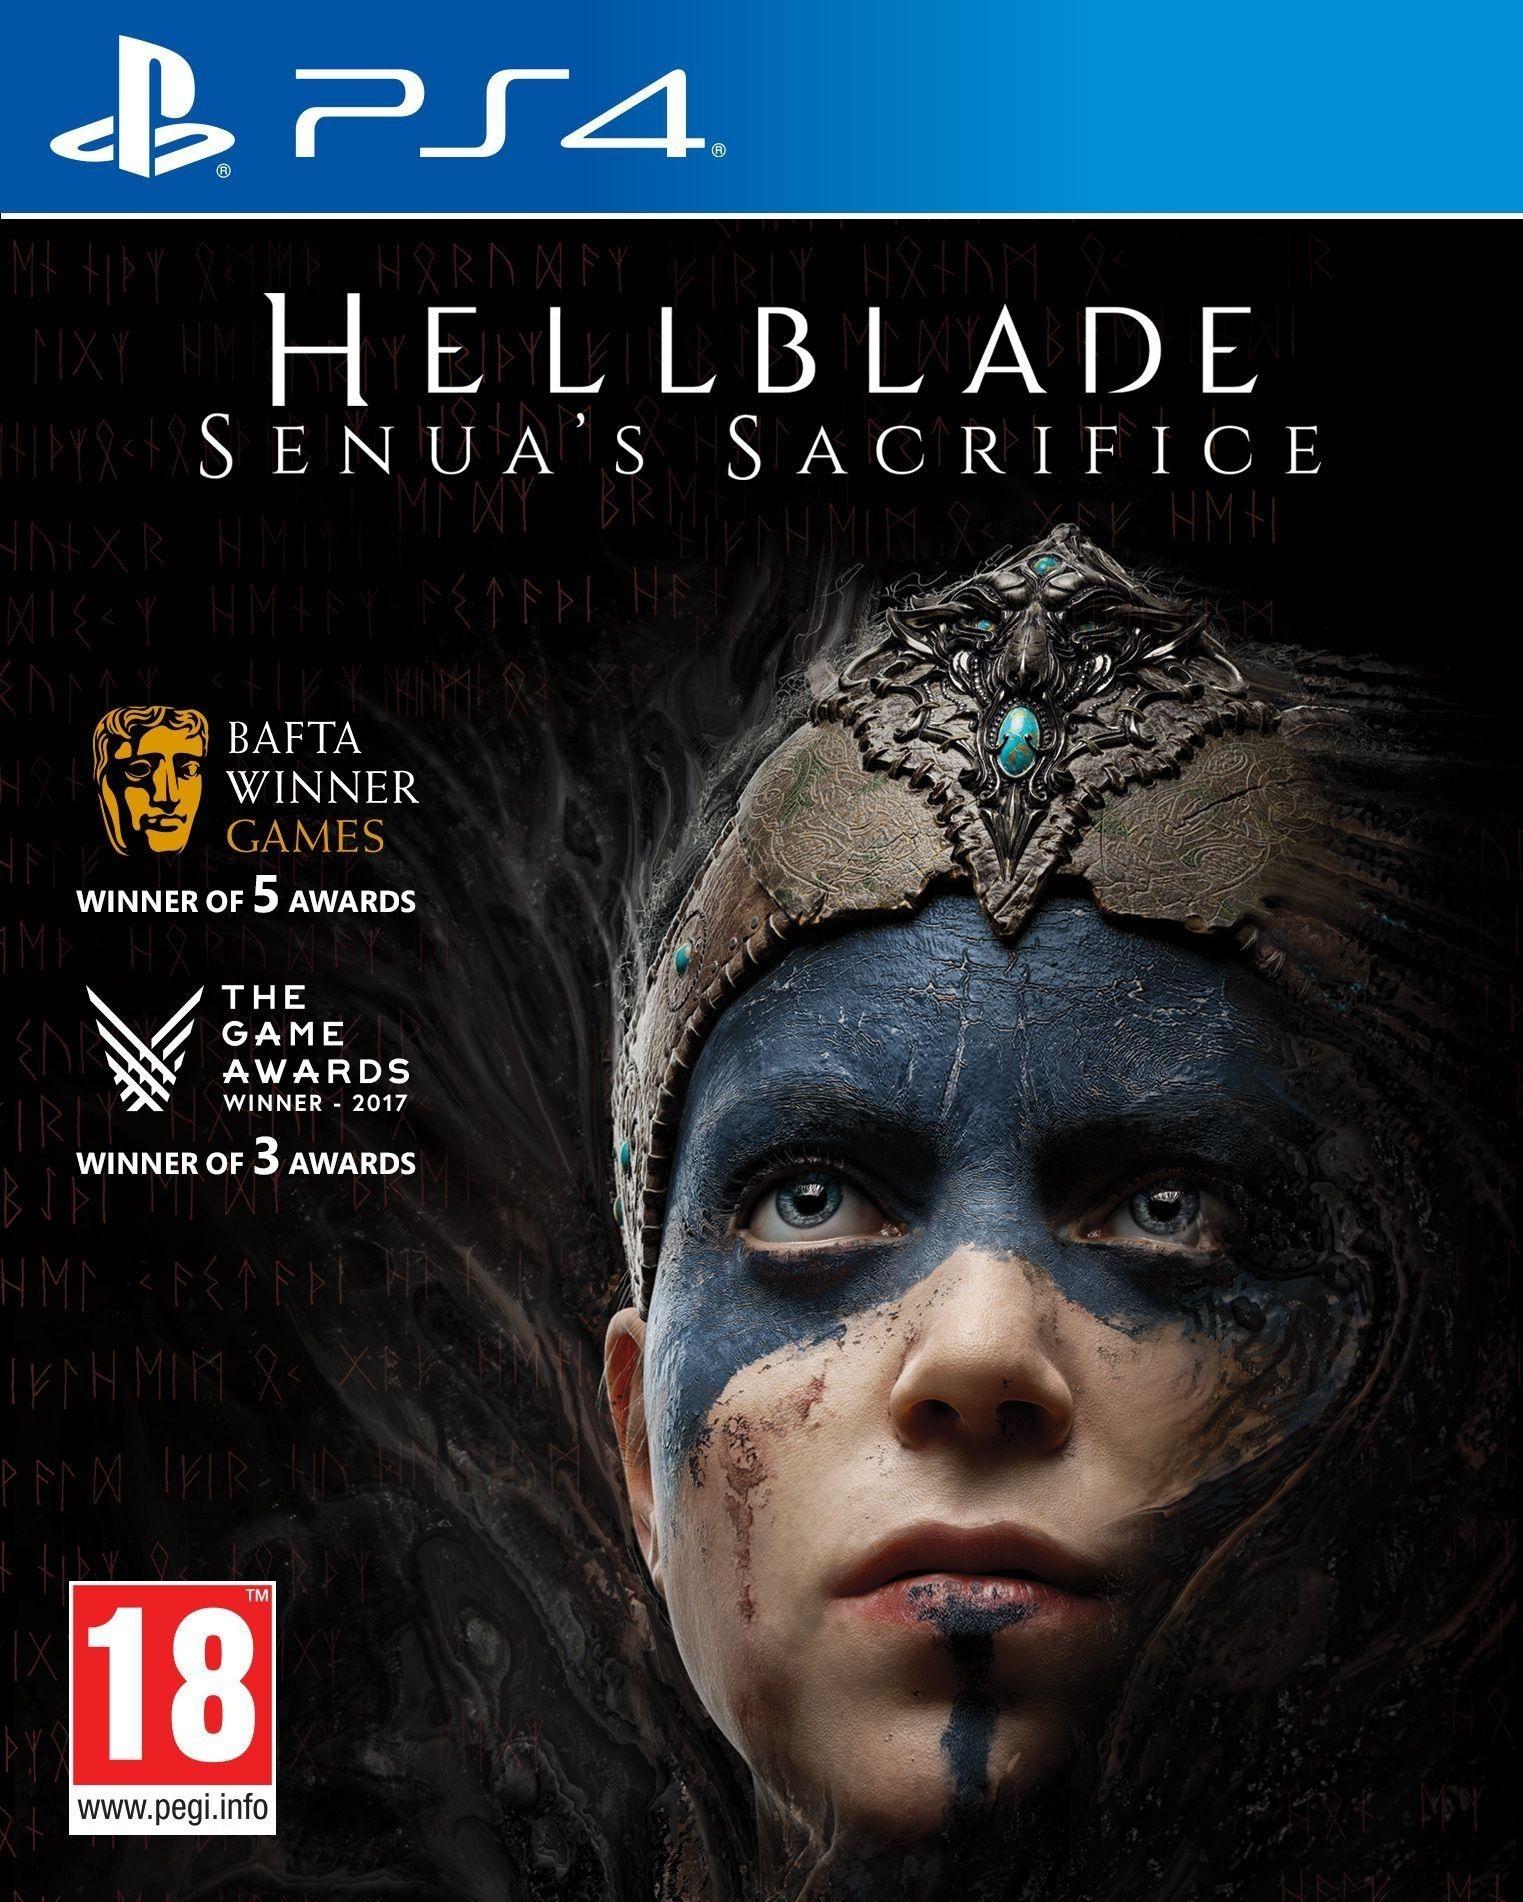 [PS4] Hellblade: Senua's Sacrifice @ Playstation Store